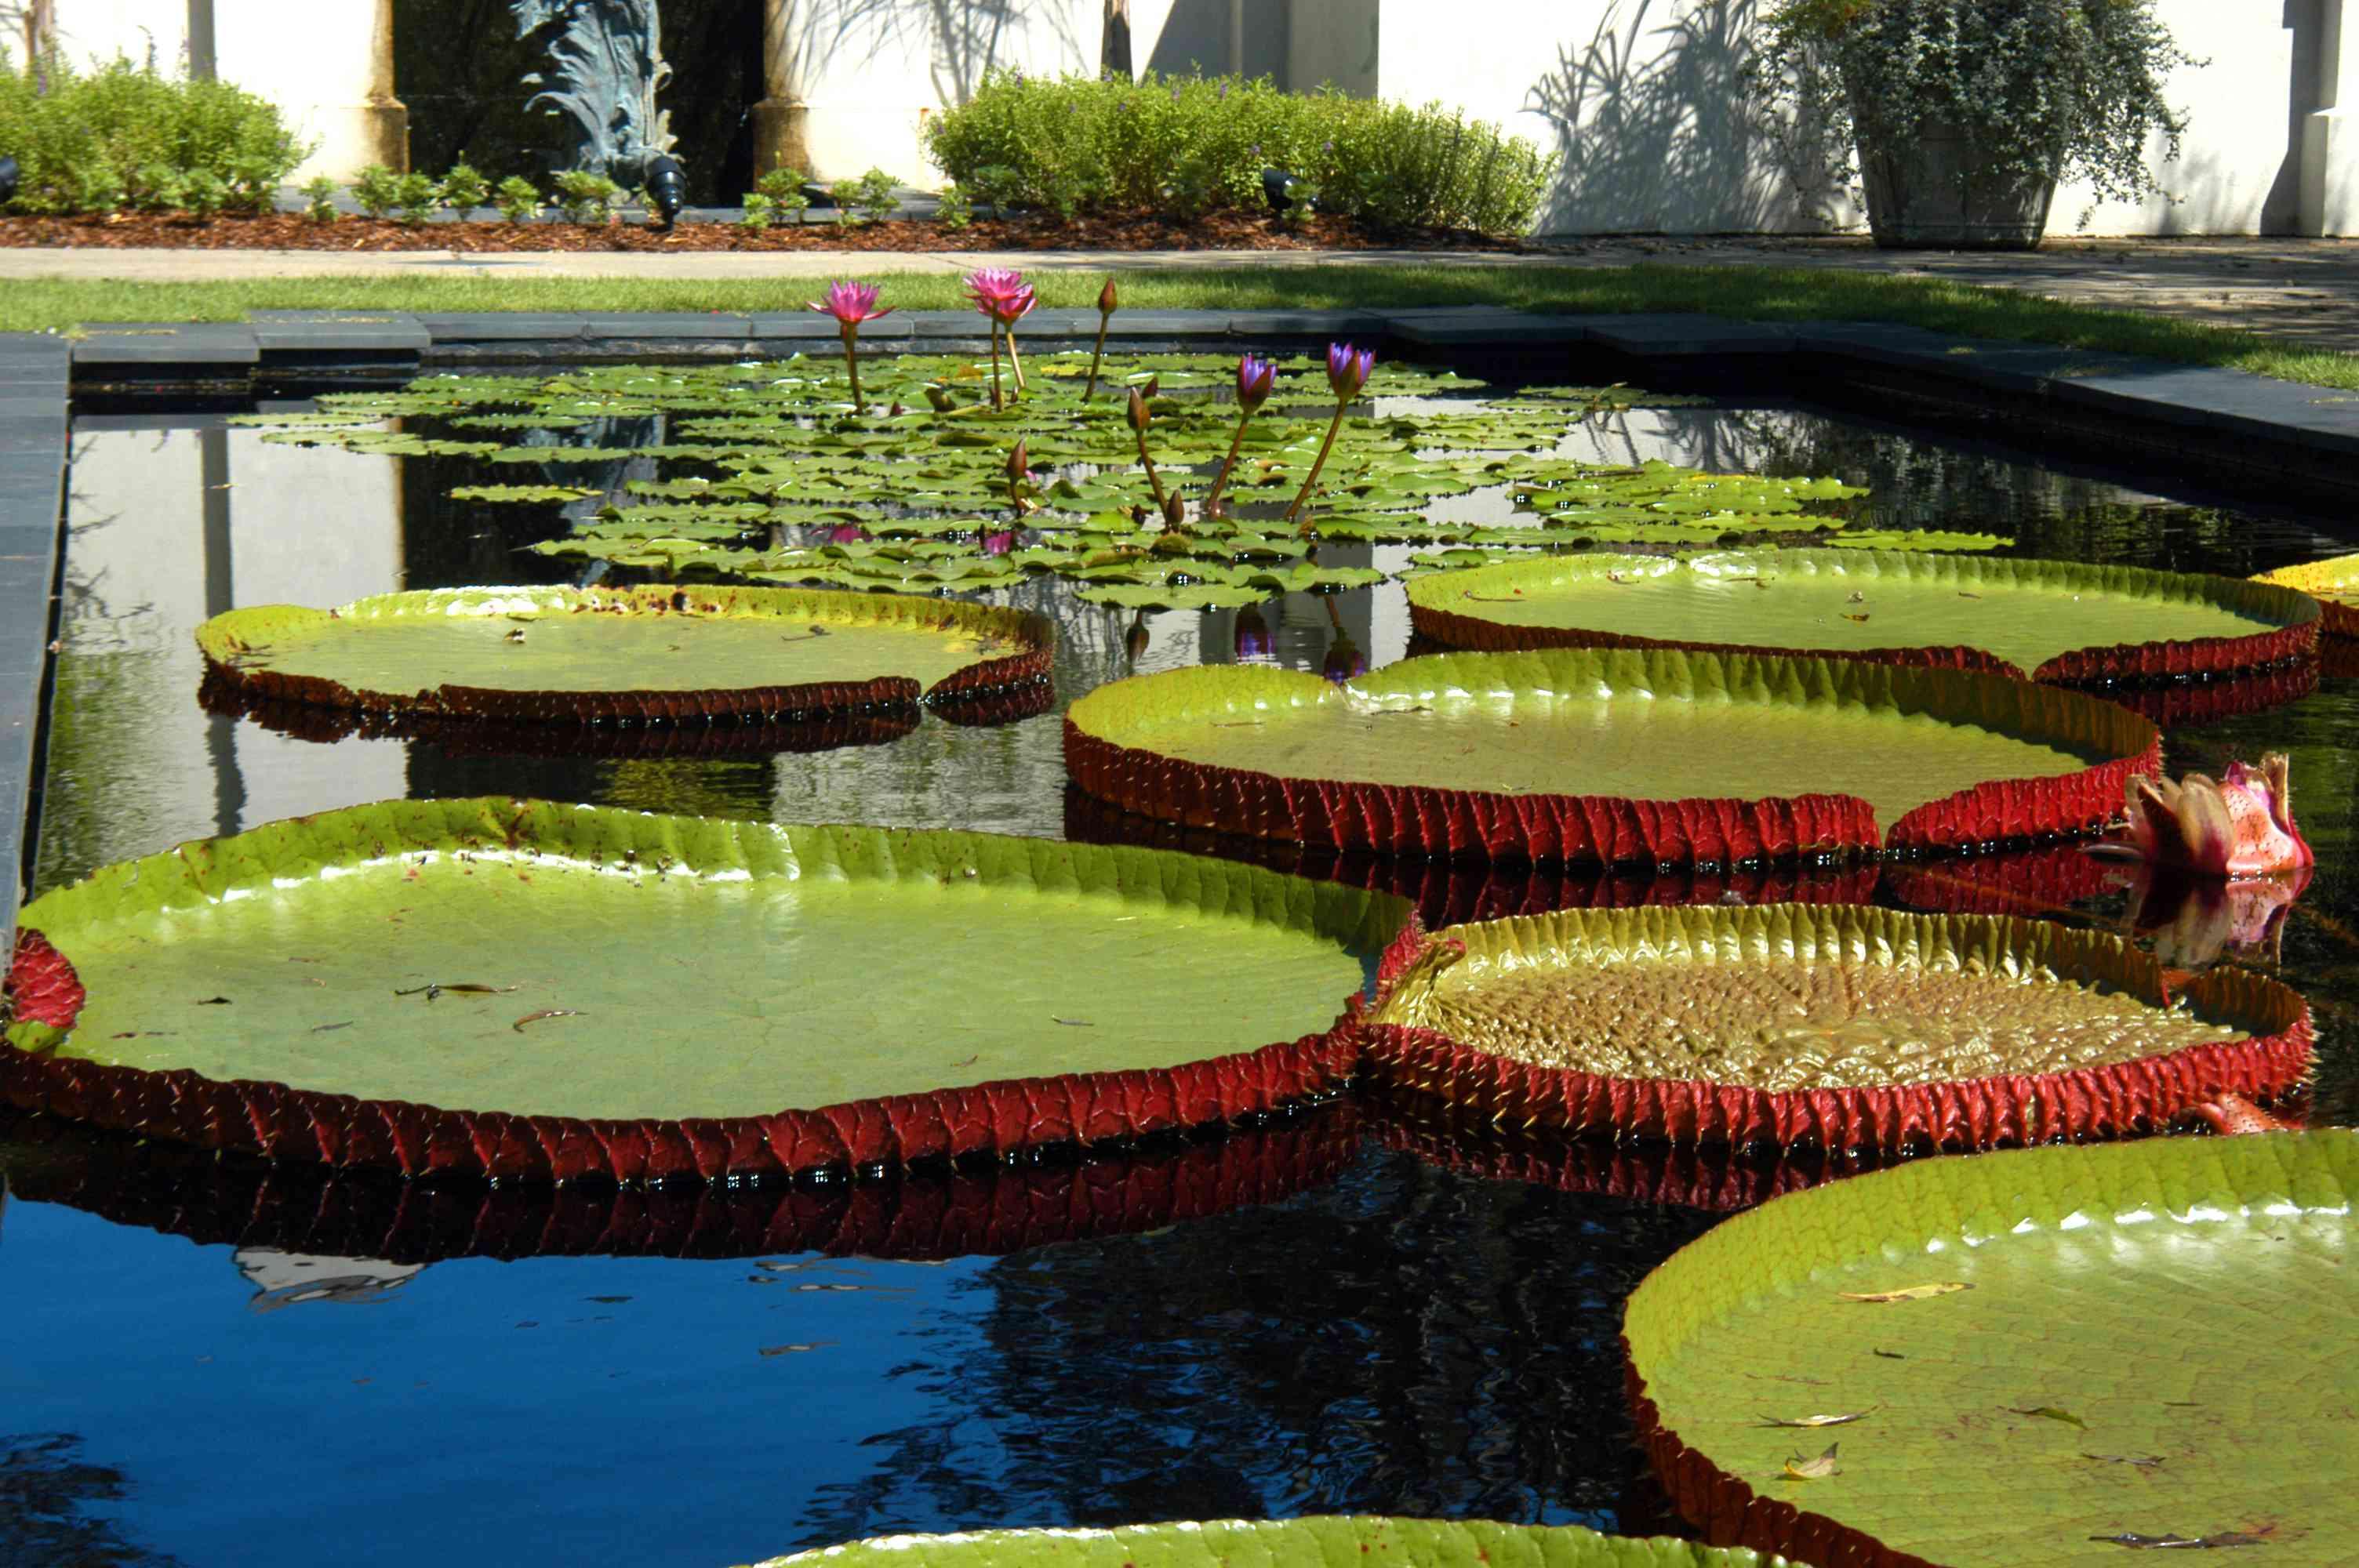 Big Lily Pads at Birmingham Botanical Gardens